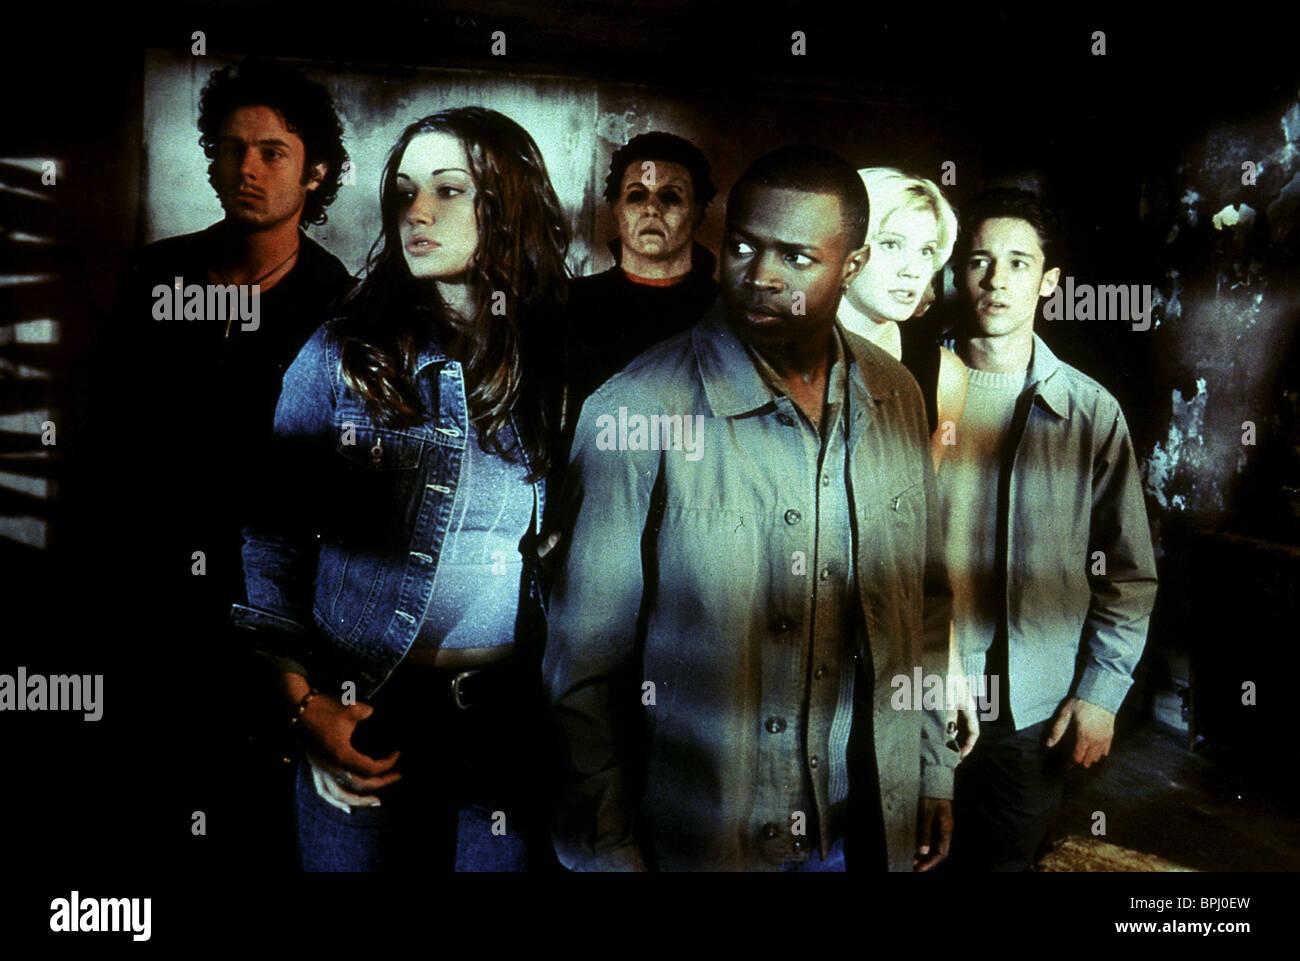 luke kirby bianca kajlich sean patrick thomas halloween resurrection halloween 8 2002 - Bianca Kajlich Halloween